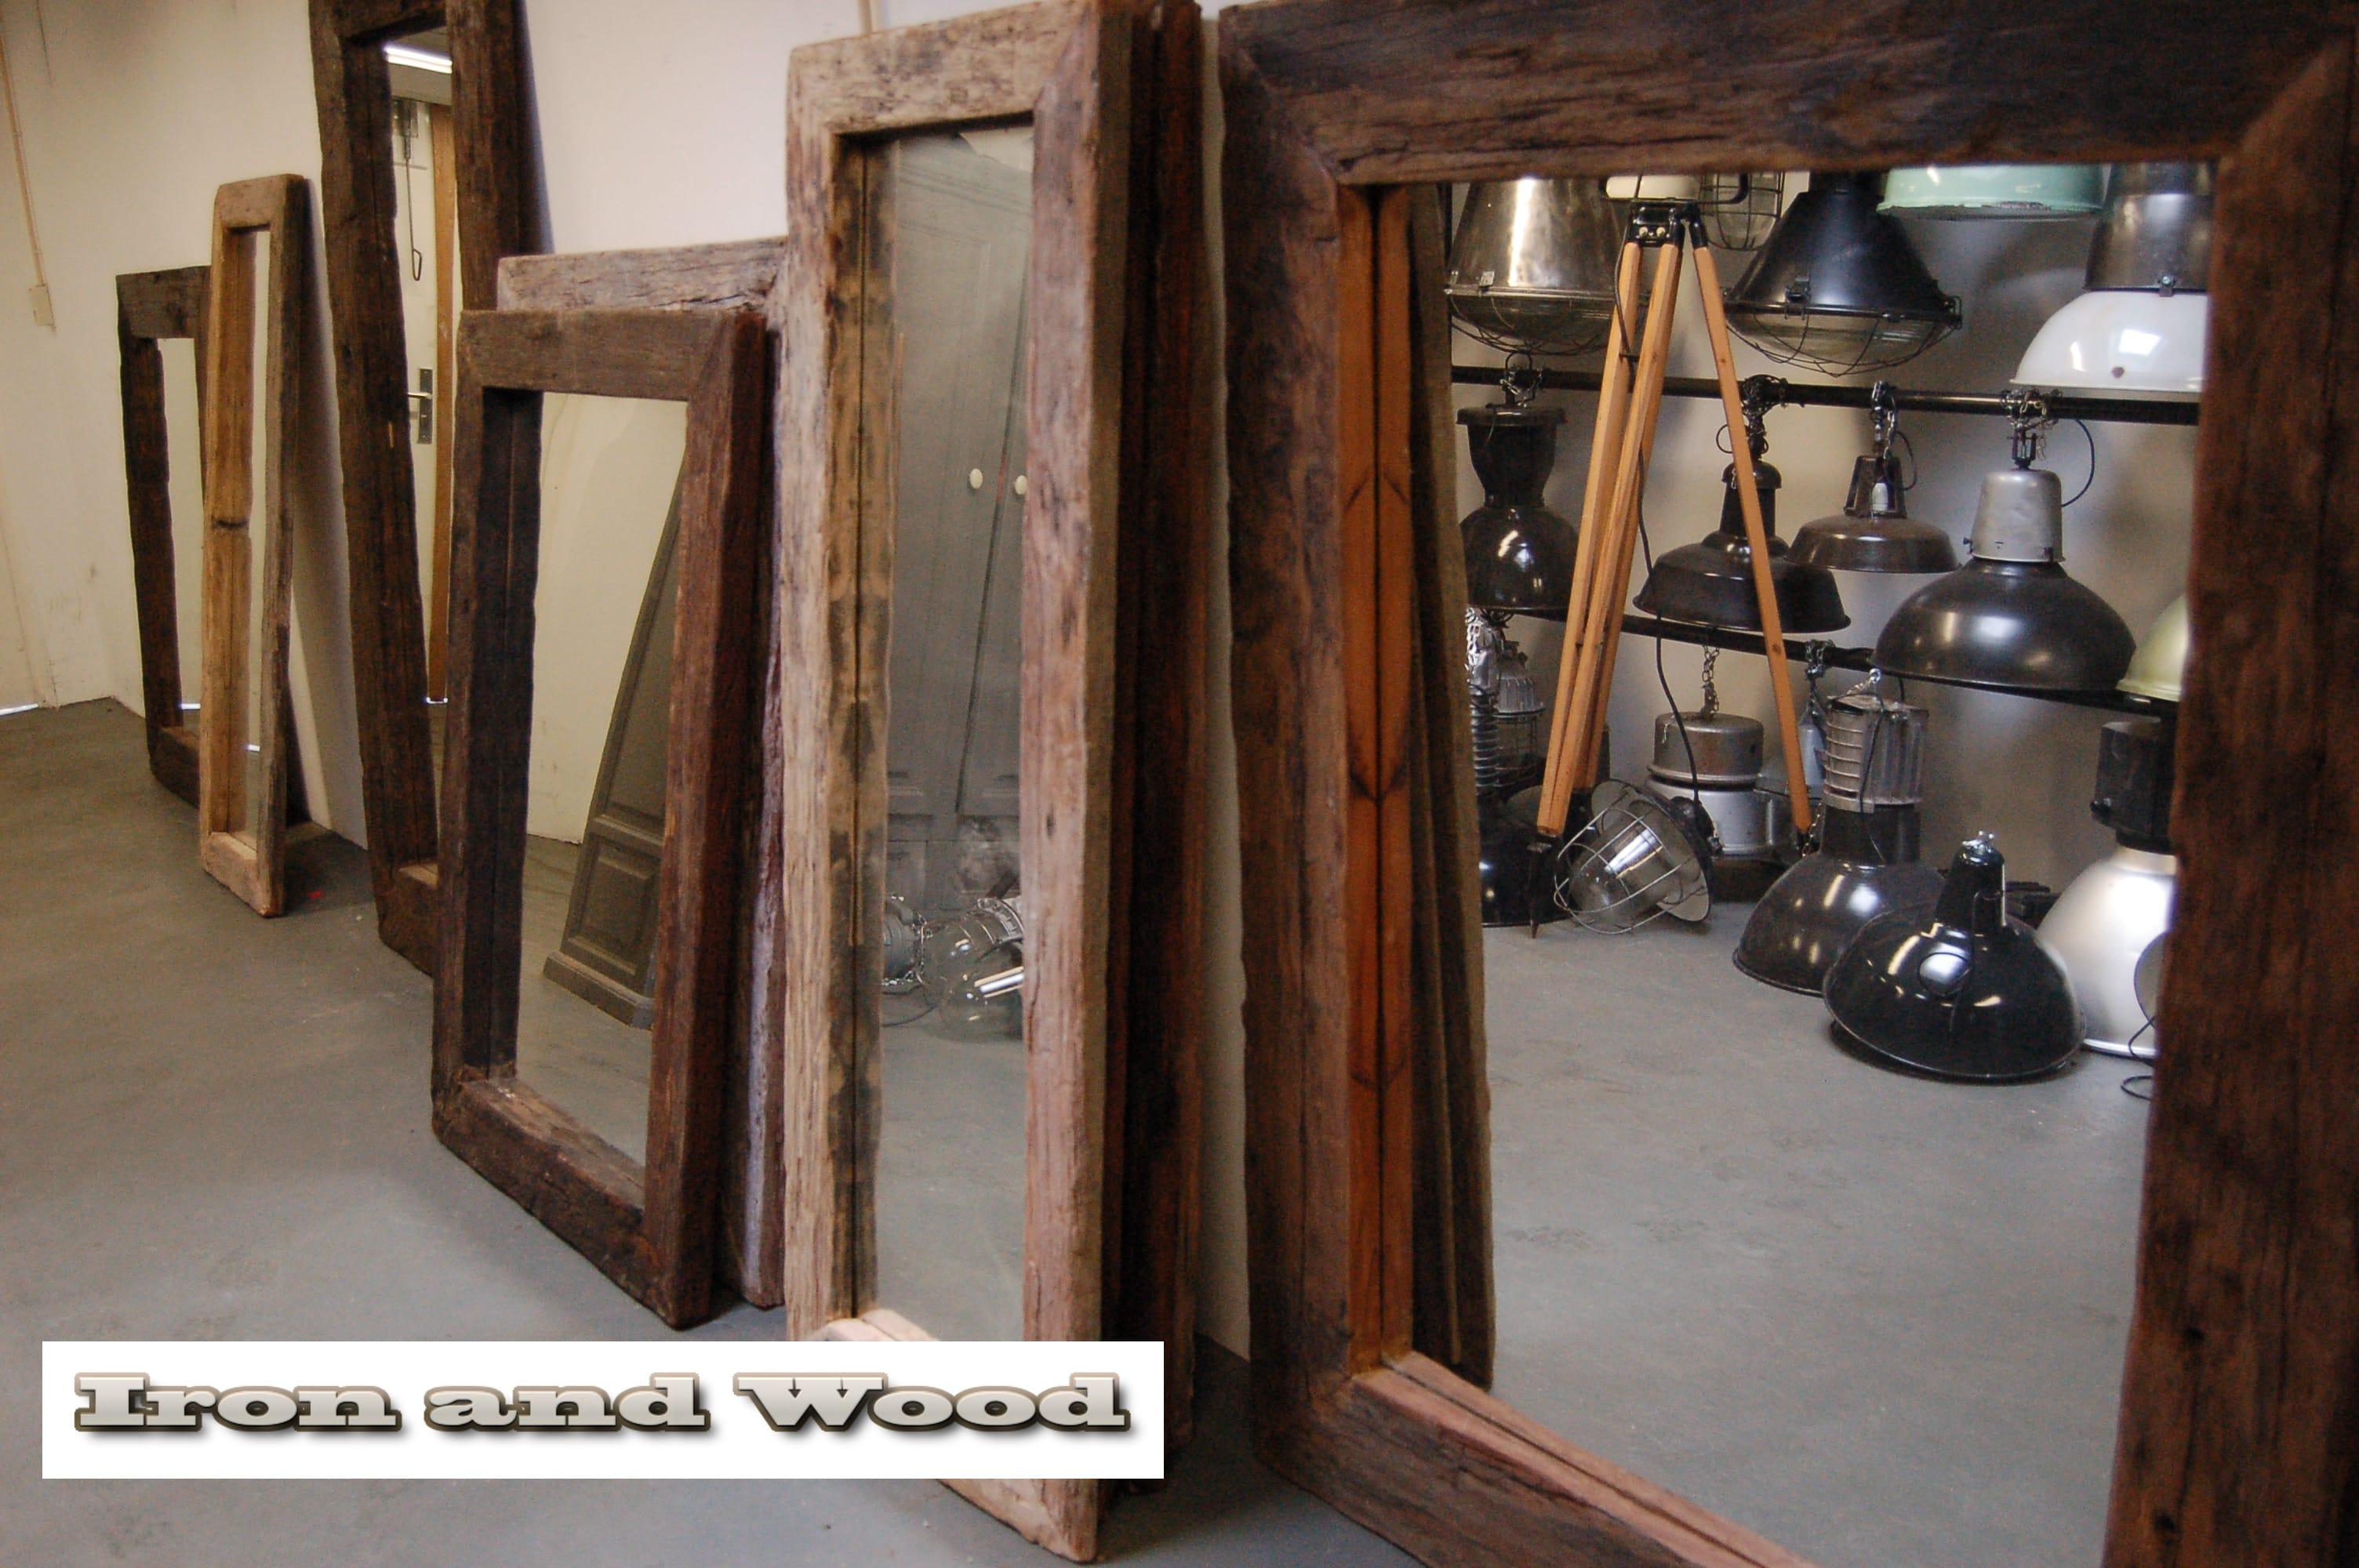 Grote Spiegel Hout : Grote spiegel van oude wagondelen wagonplanken handgemaakte